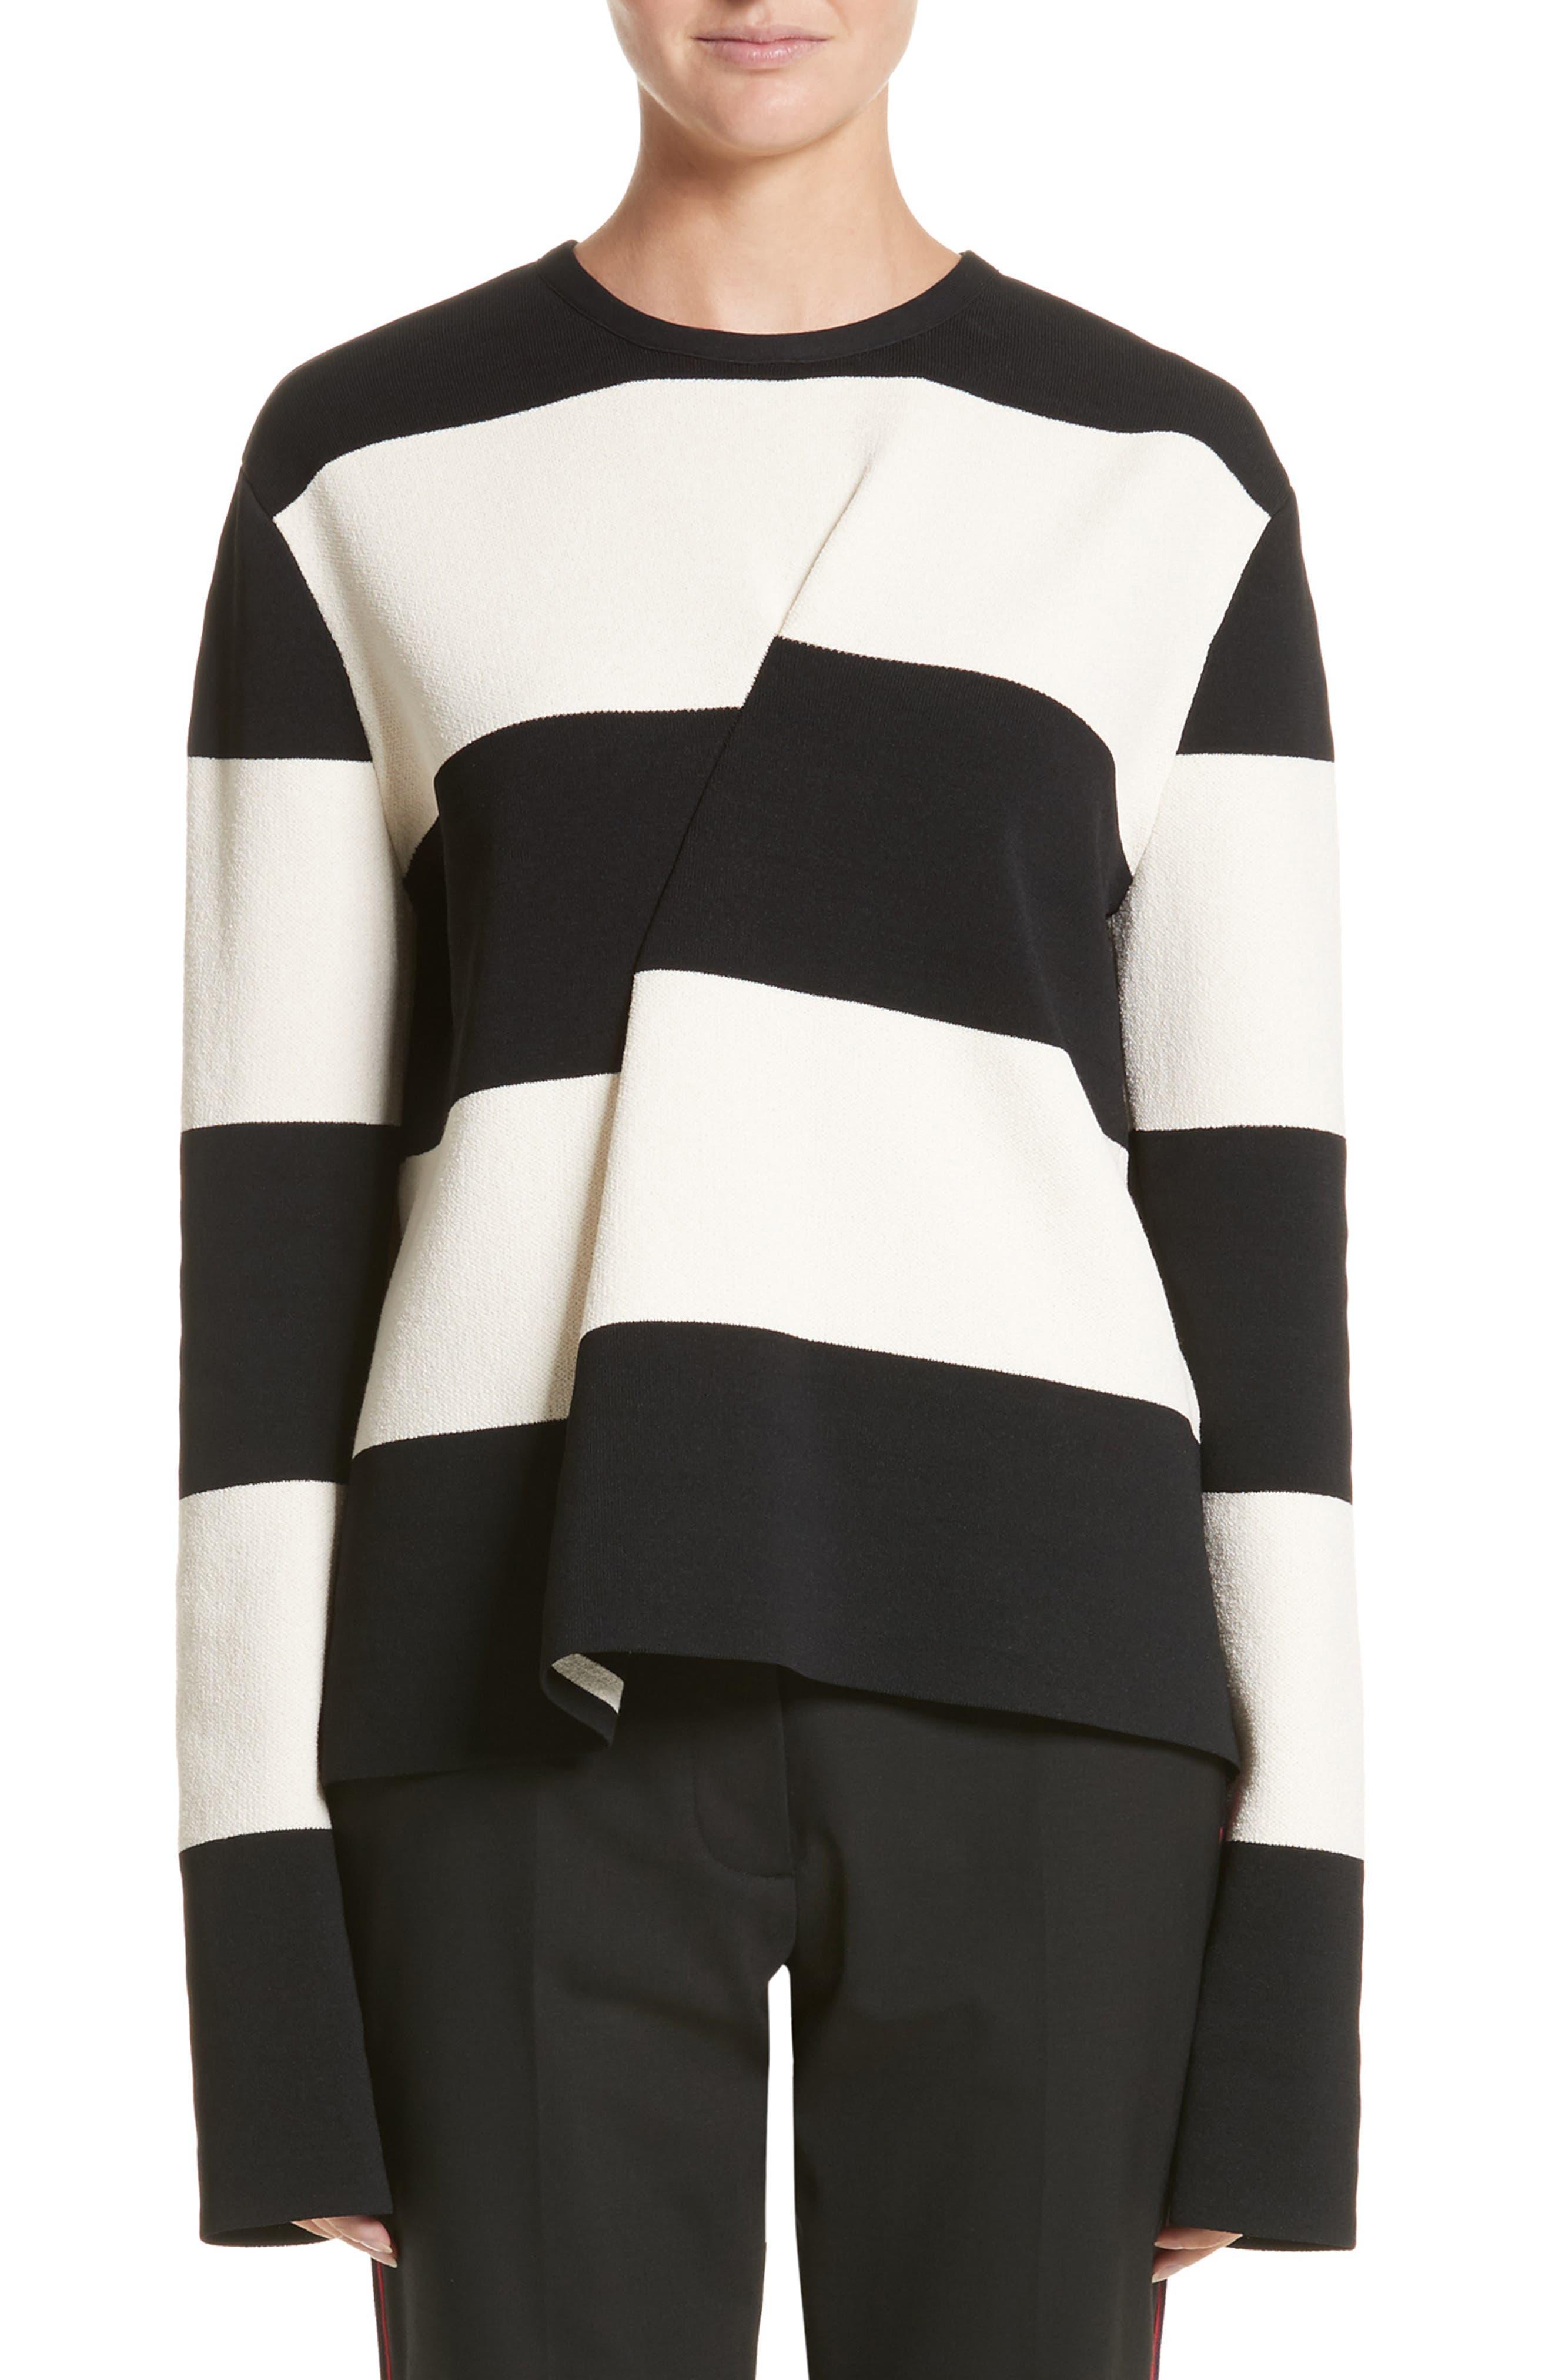 Main Image - CALVIN KLEIN 205W39NYC Folded Stripe Sweater